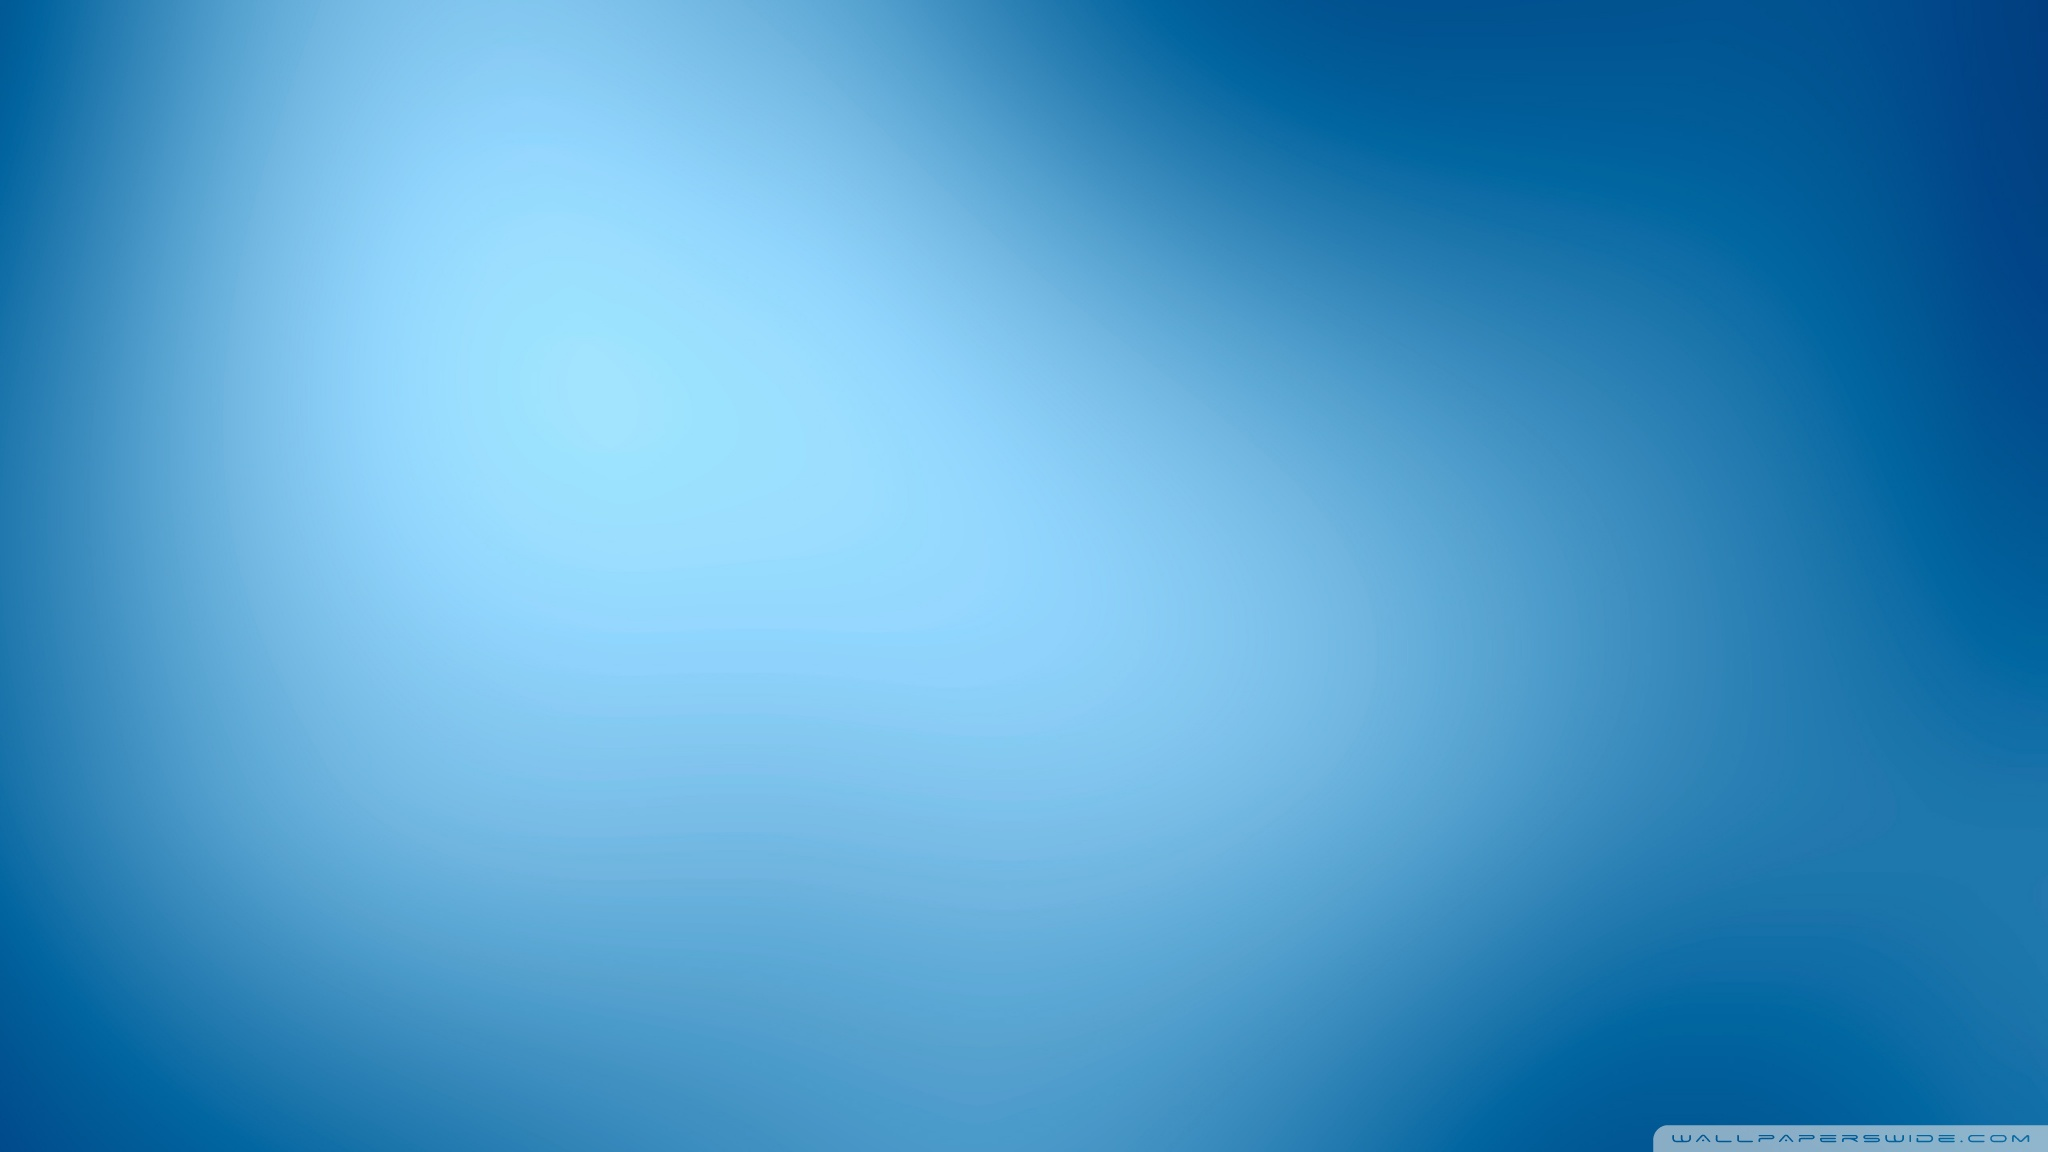 simple blue background wallpaper 20481152jpg Column X 2048x1152